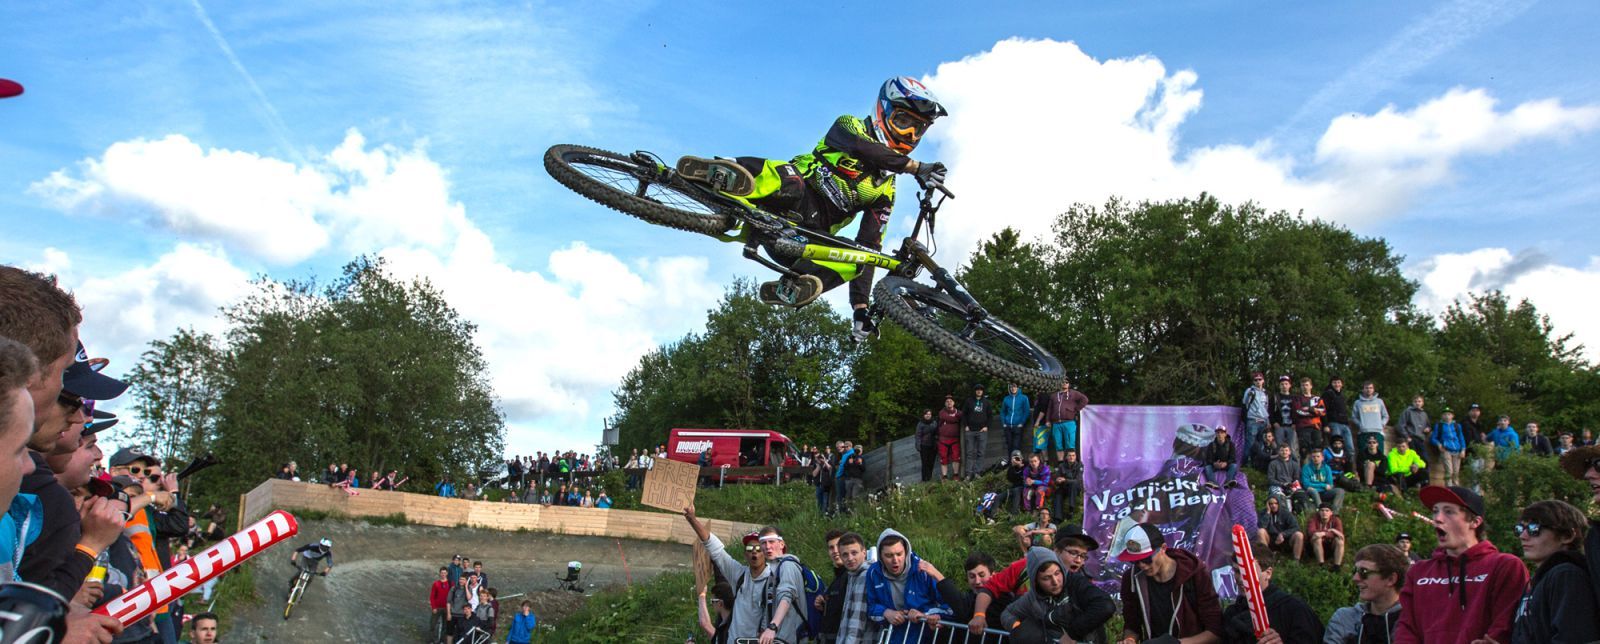 Manuel Gruber - Whip Offs iXS Dirt Masters 2014